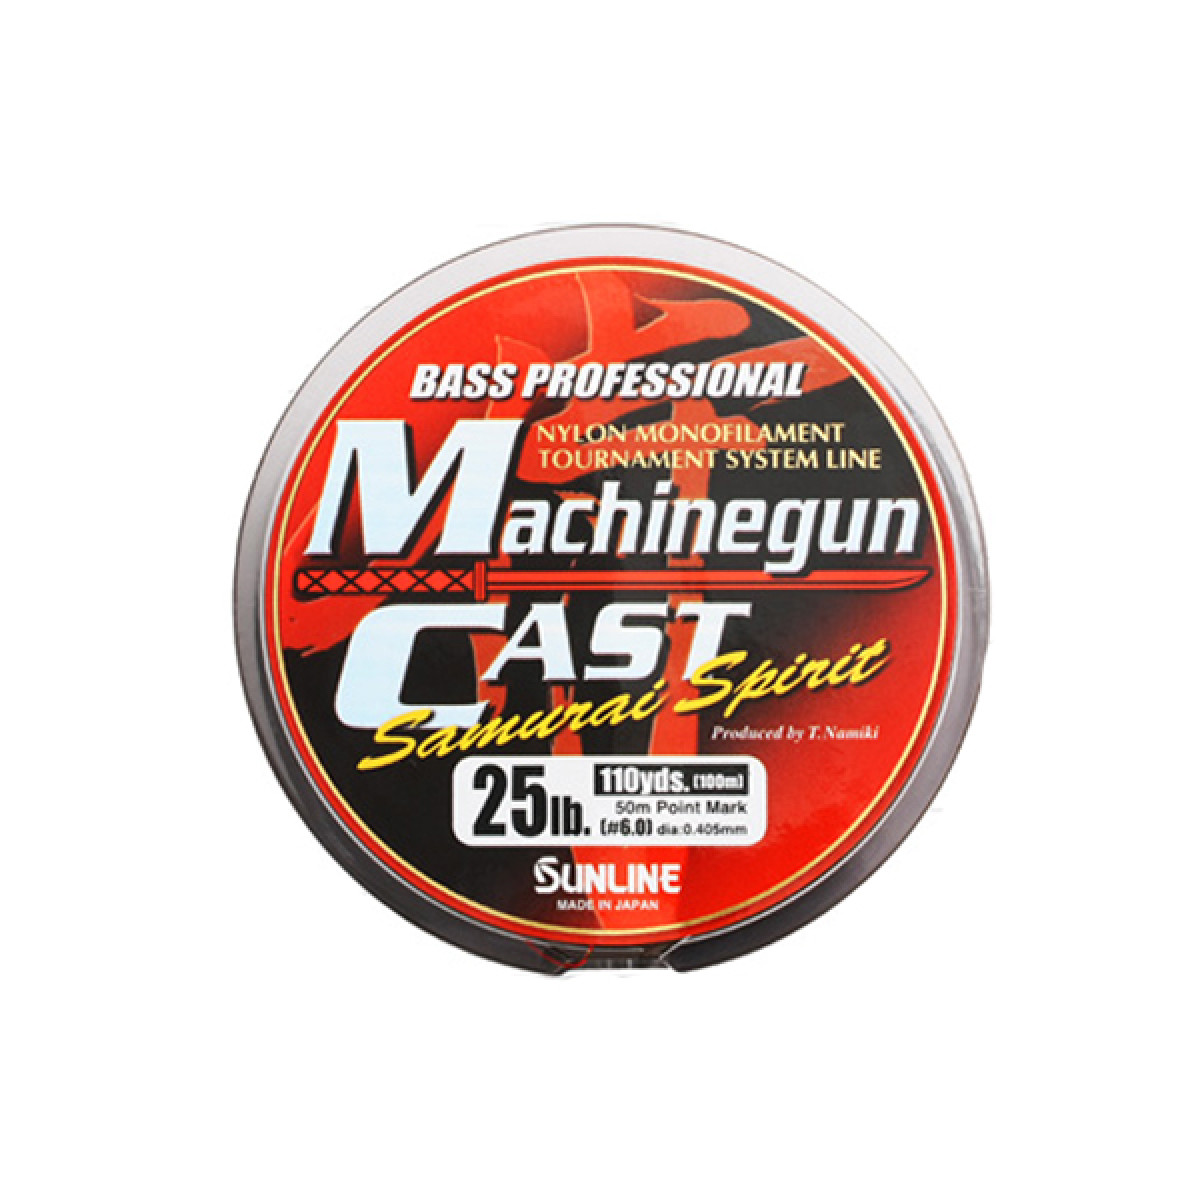 Machinegun Cast